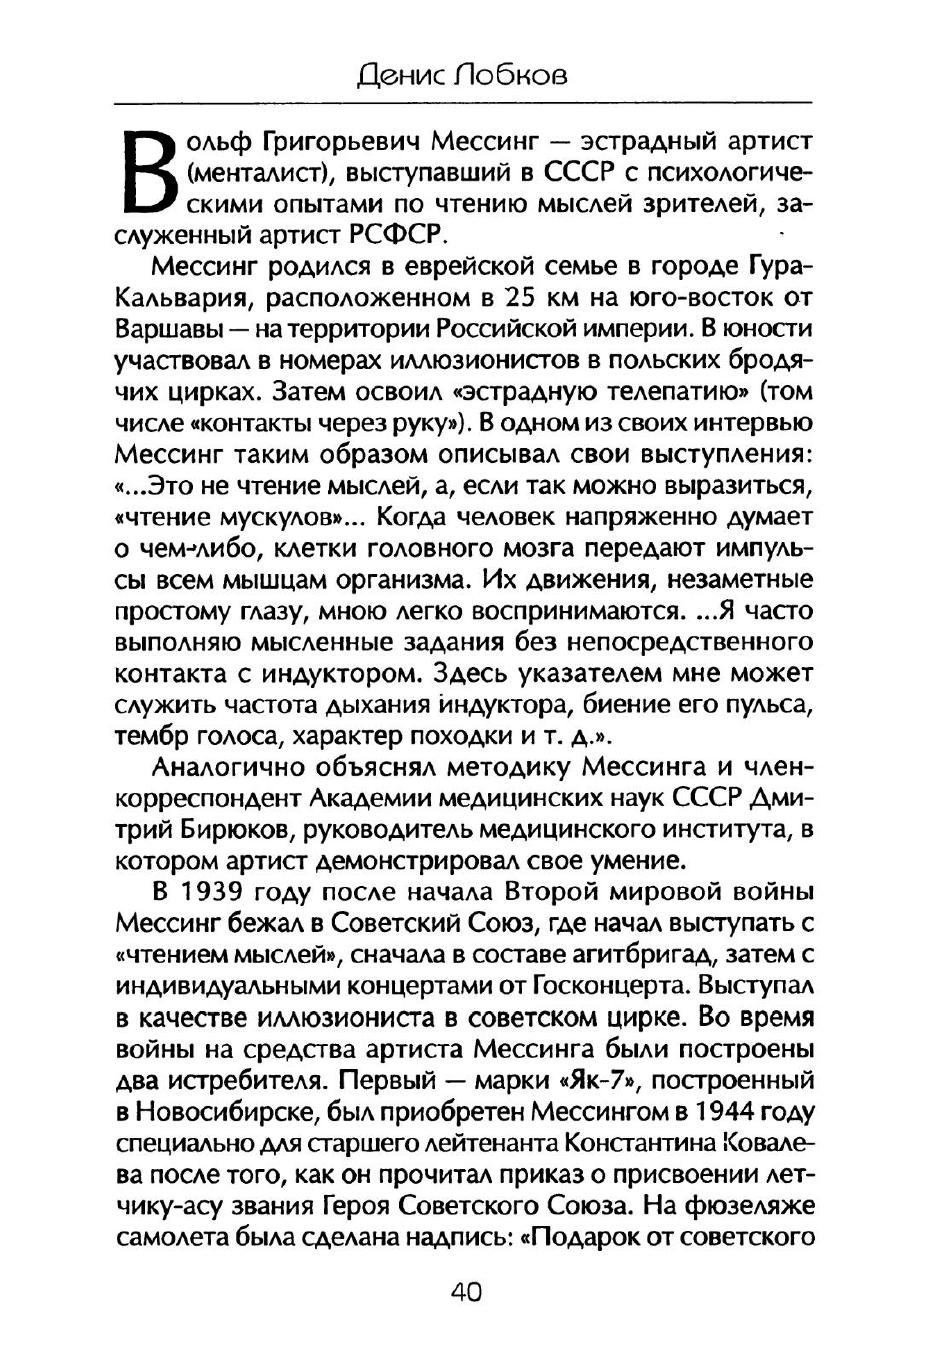 http://images.vfl.ru/ii/1407266721/2f928e3e/5908737.jpg